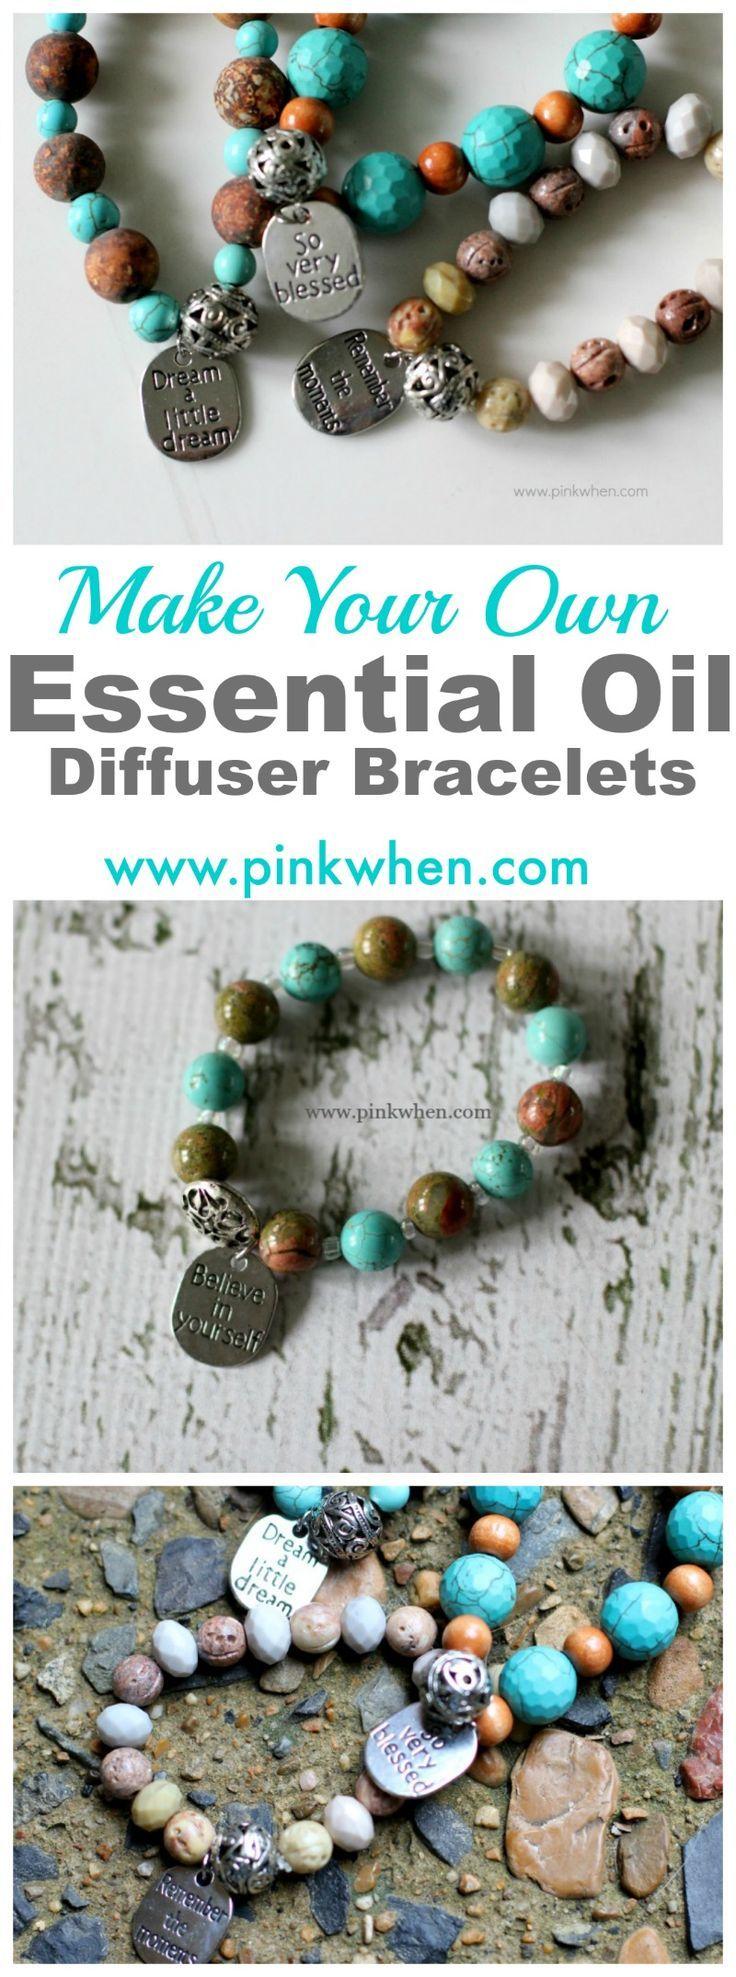 DIY Essential Oil Diffuser Bracelets